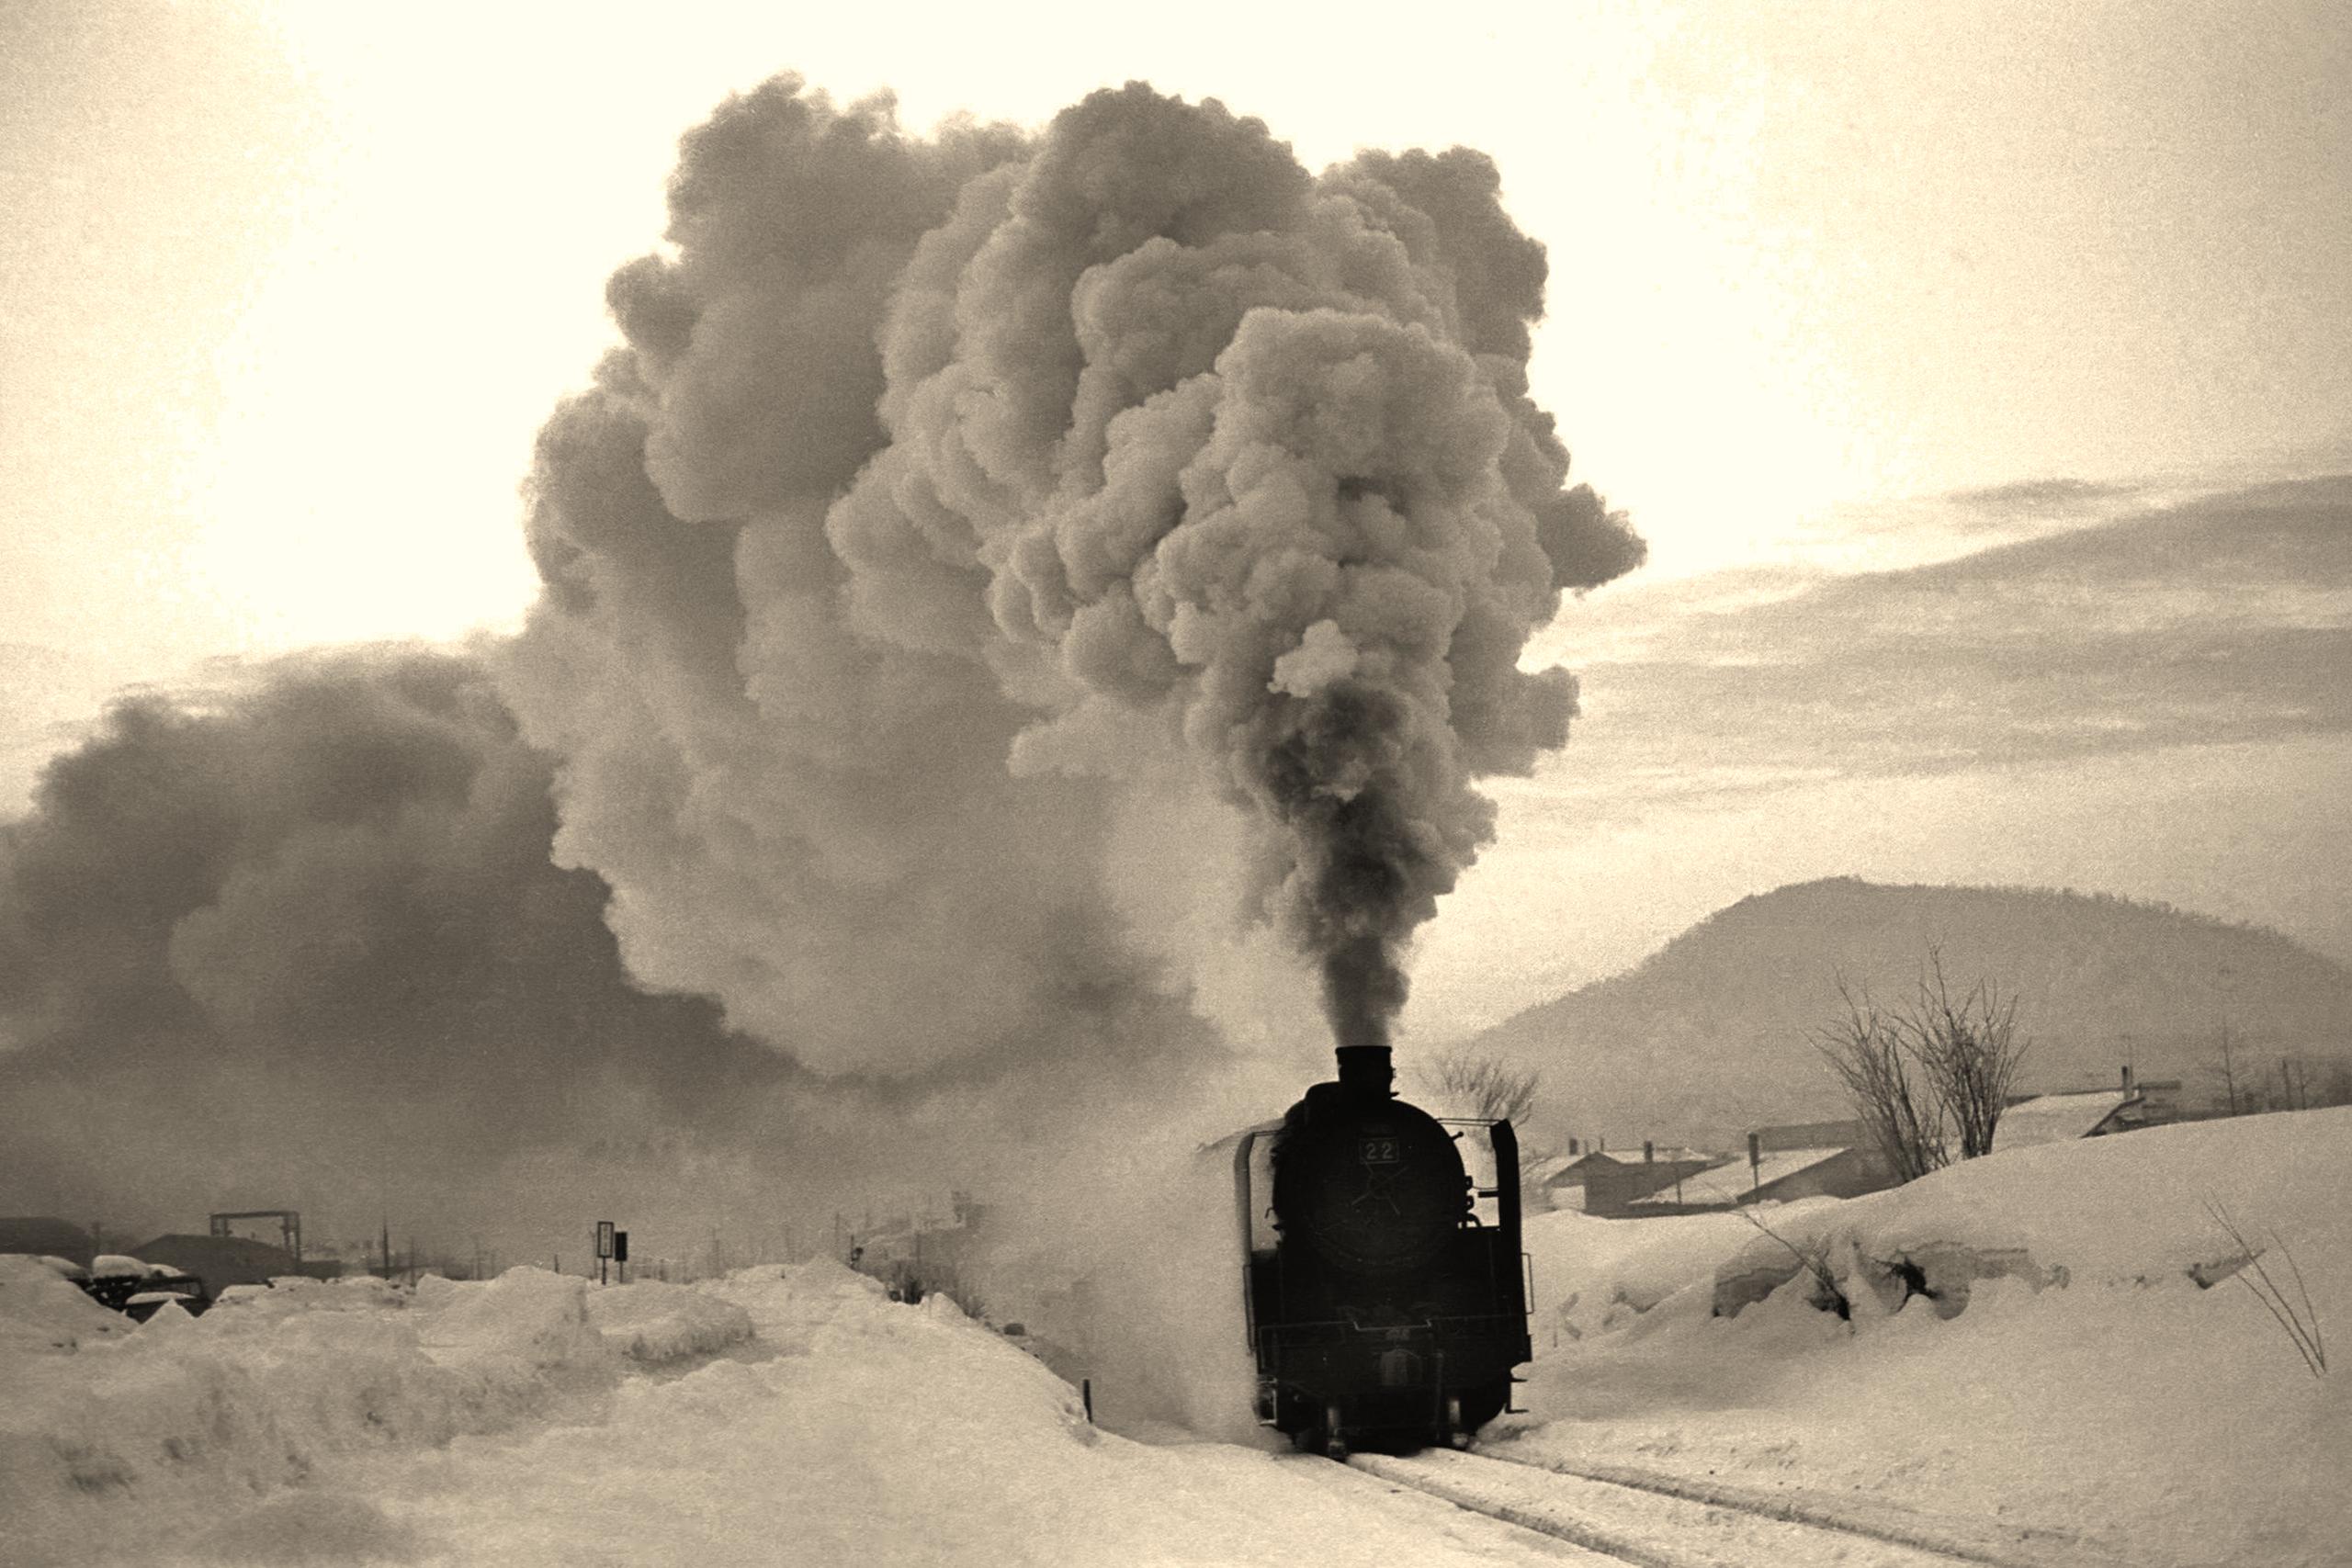 La bella locomotiva